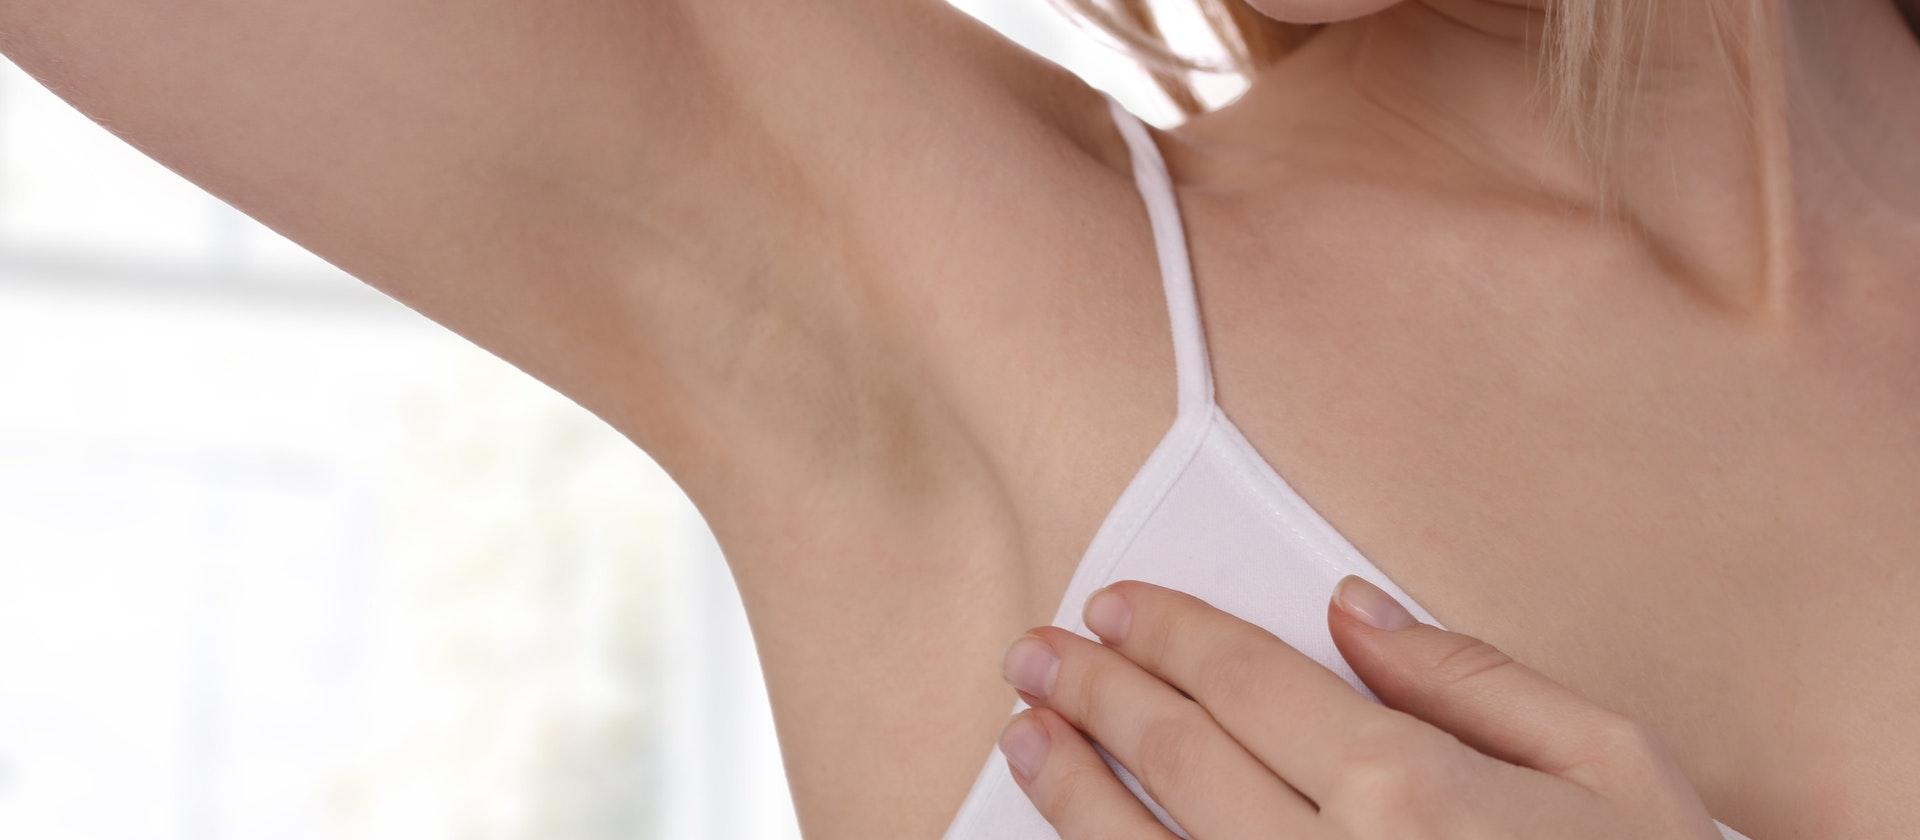 Armpit Lump Symptoms Causes Treatment Options Buoy